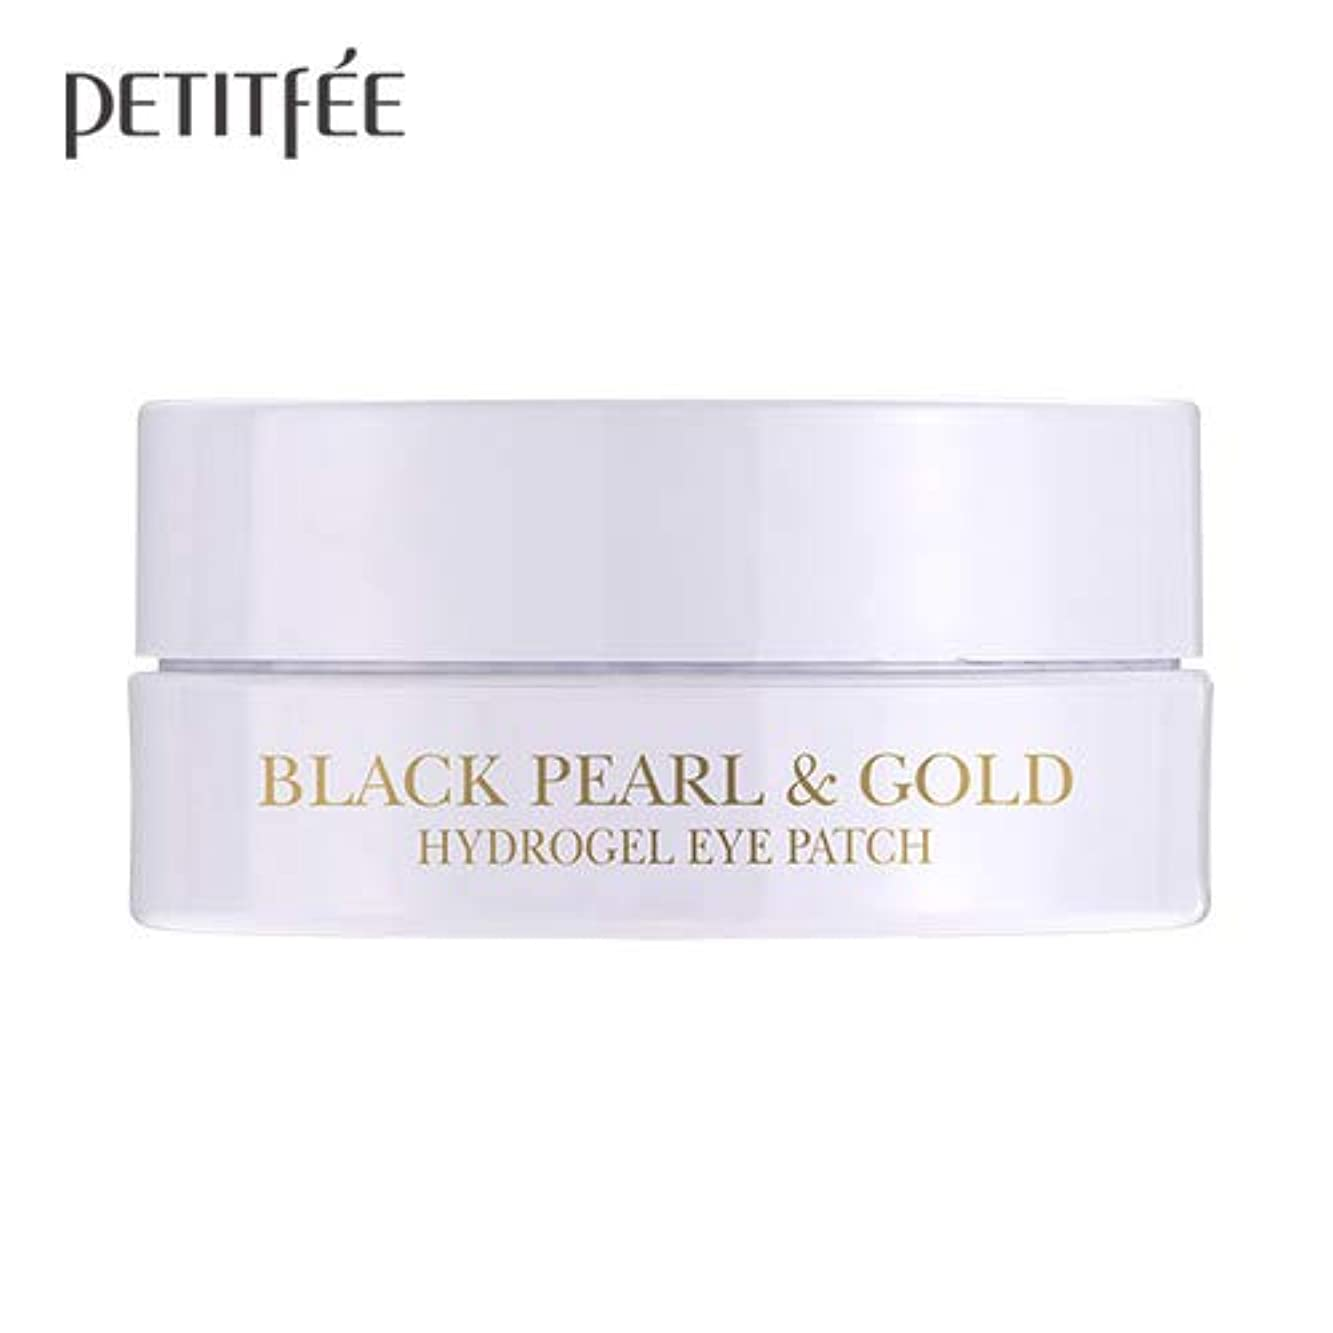 (3 Pack) PETITFEE Black Pearl & Gold Hydrogel Eye Patch 60 Pieces (並行輸入品)